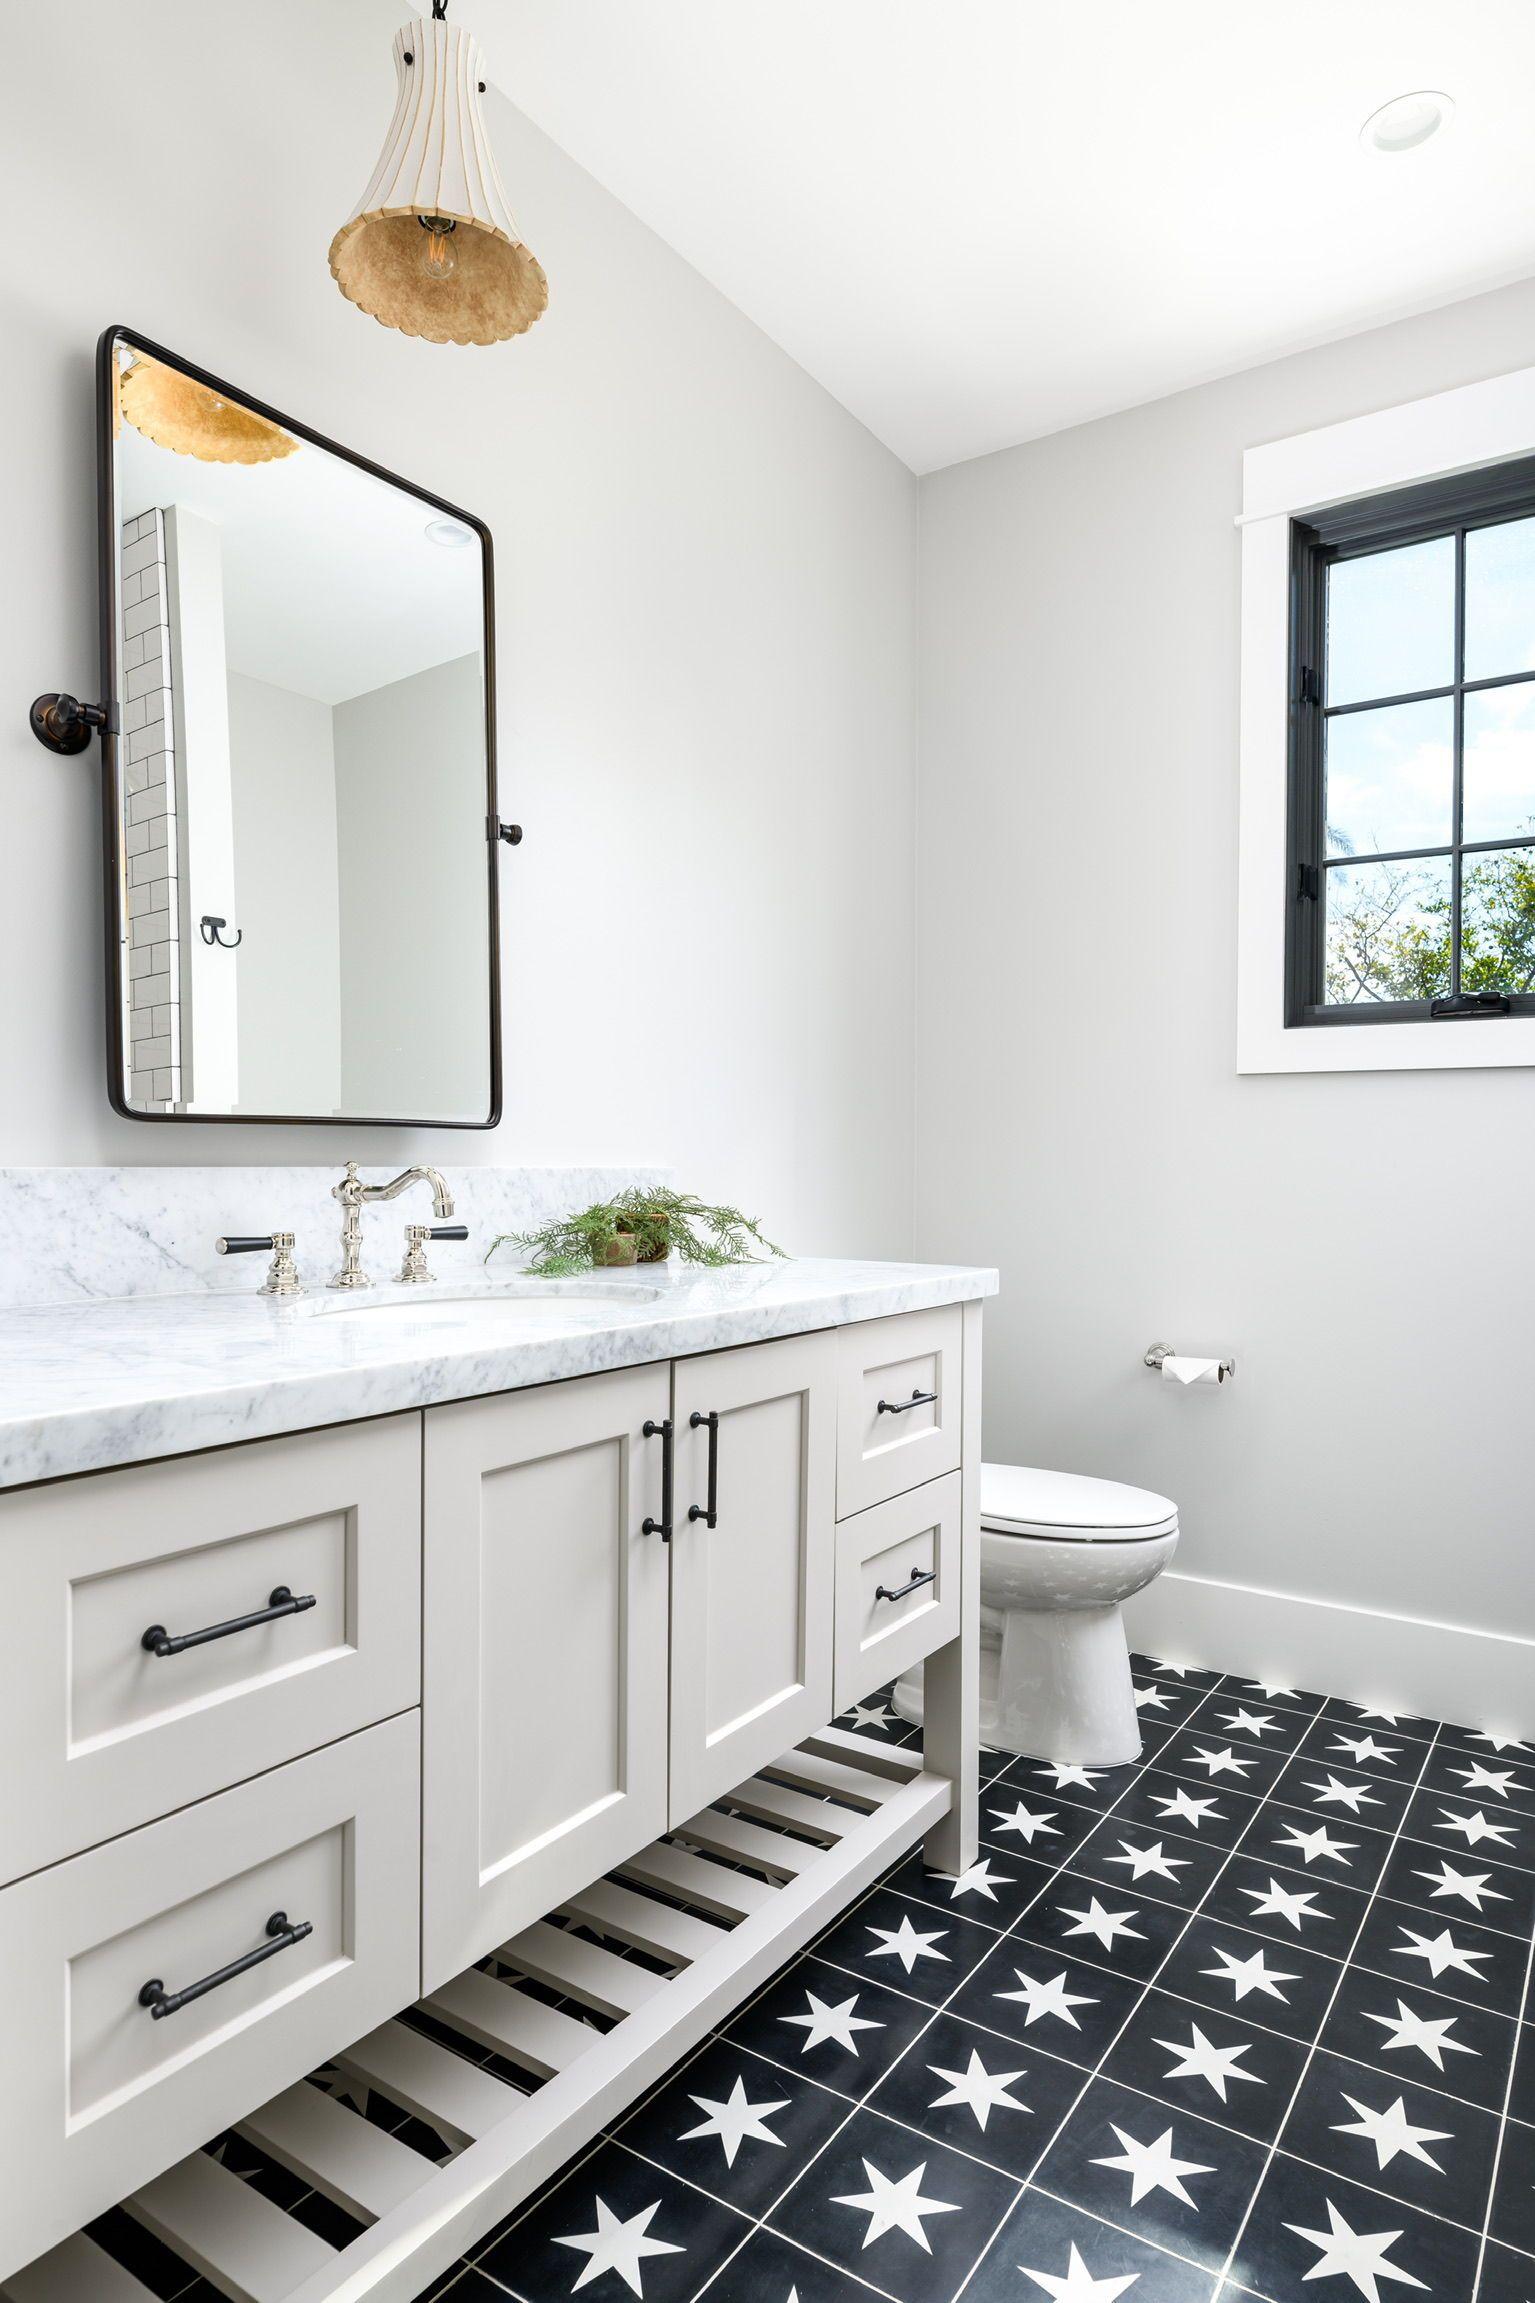 Black And White Tile Bathroom Floor In 2020 Black Tile Bathrooms White Tile Bathroom Floor Black And White Bathroom Floor